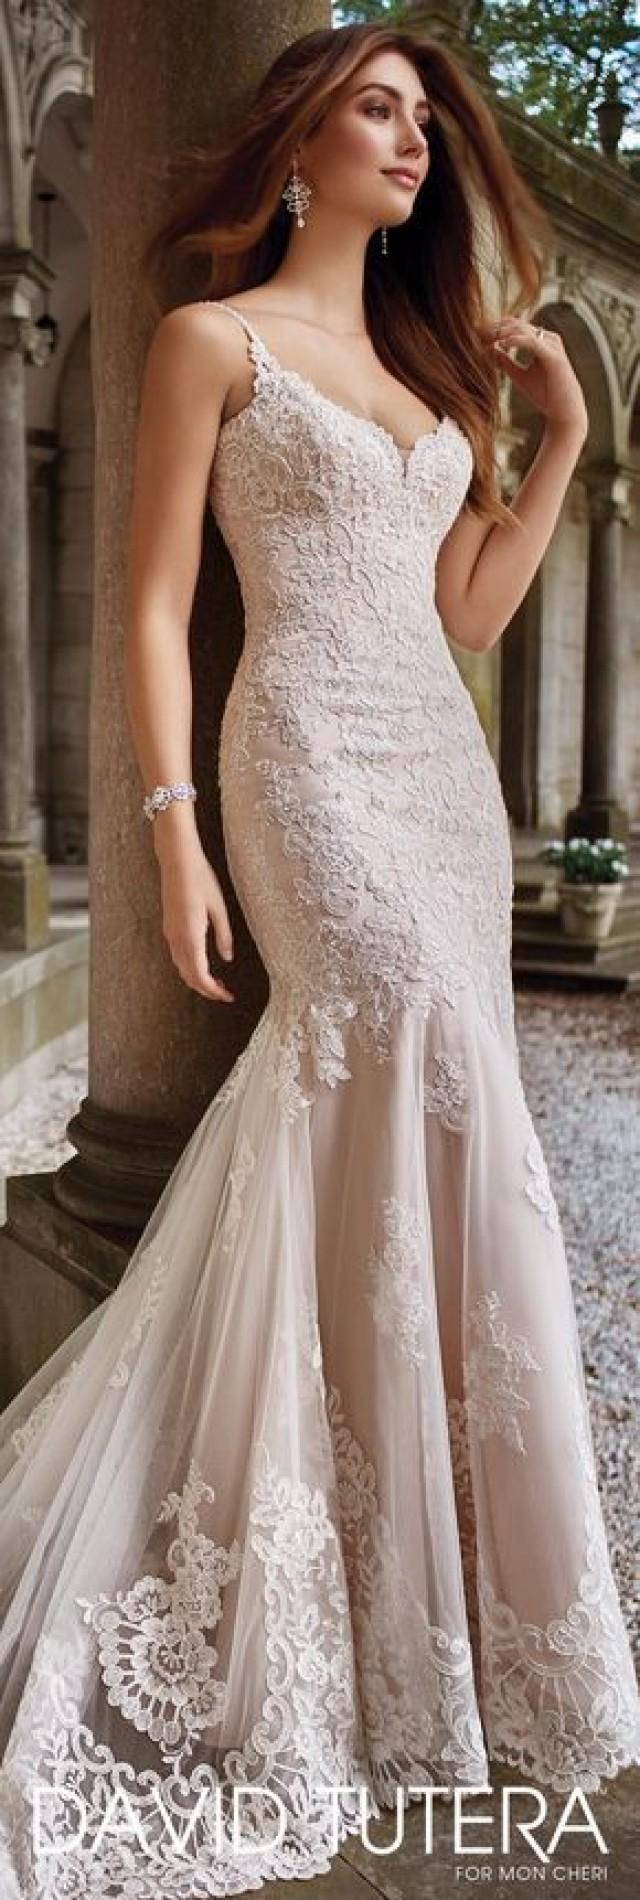 David Tutera Wedding Dresses Hand Beaded Spaghetti Strap Wedding Dress 117282 Kula David Tutera 2731746 Weddbook,Budget Wedding Dresses Brisbane